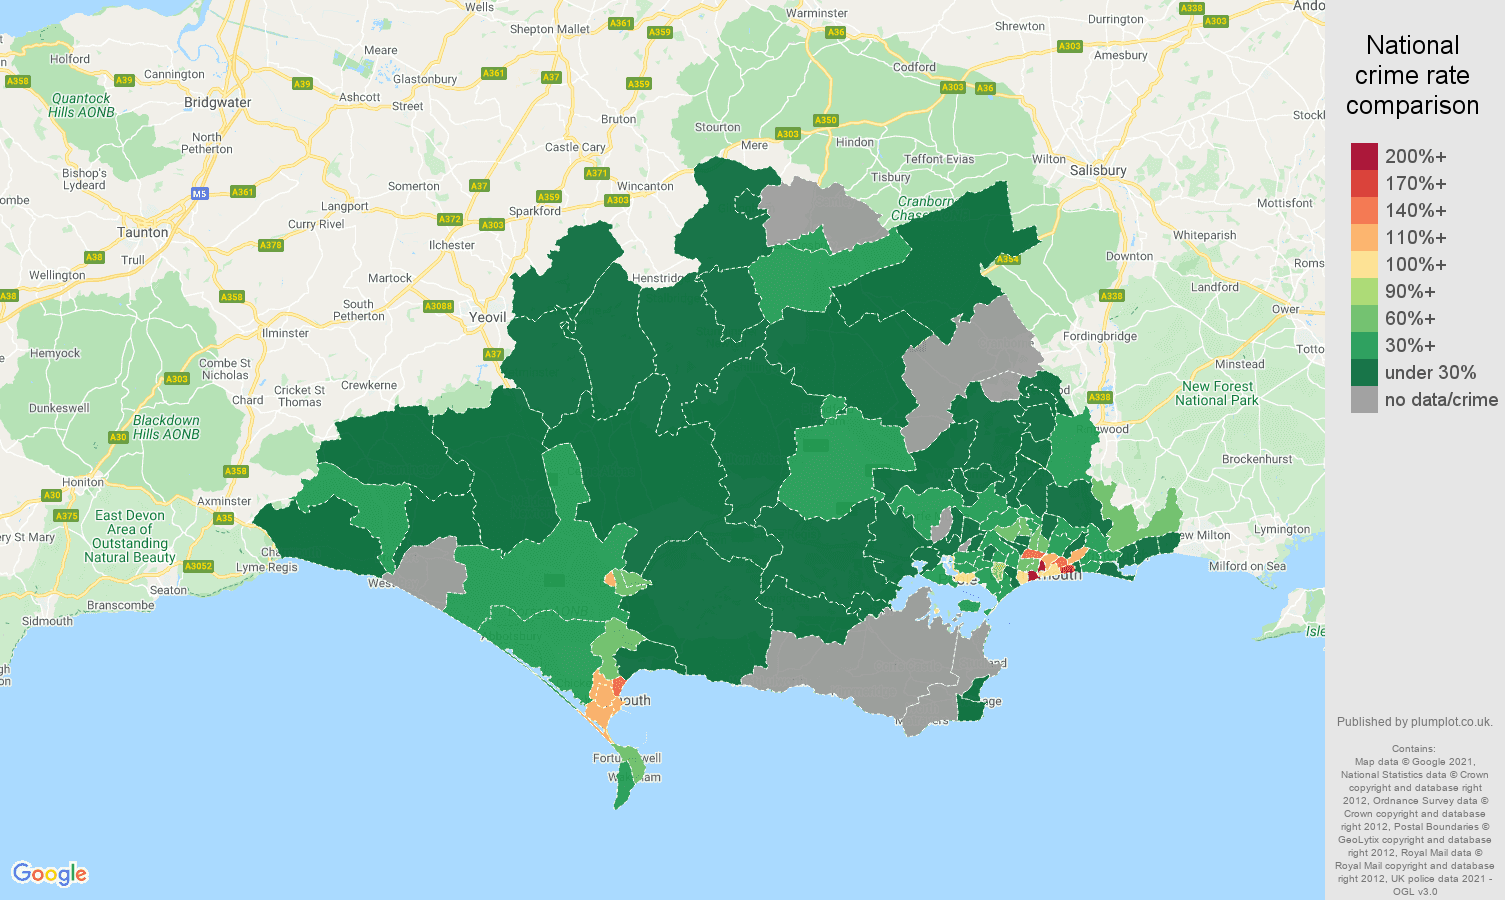 Dorset drugs crime rate comparison map